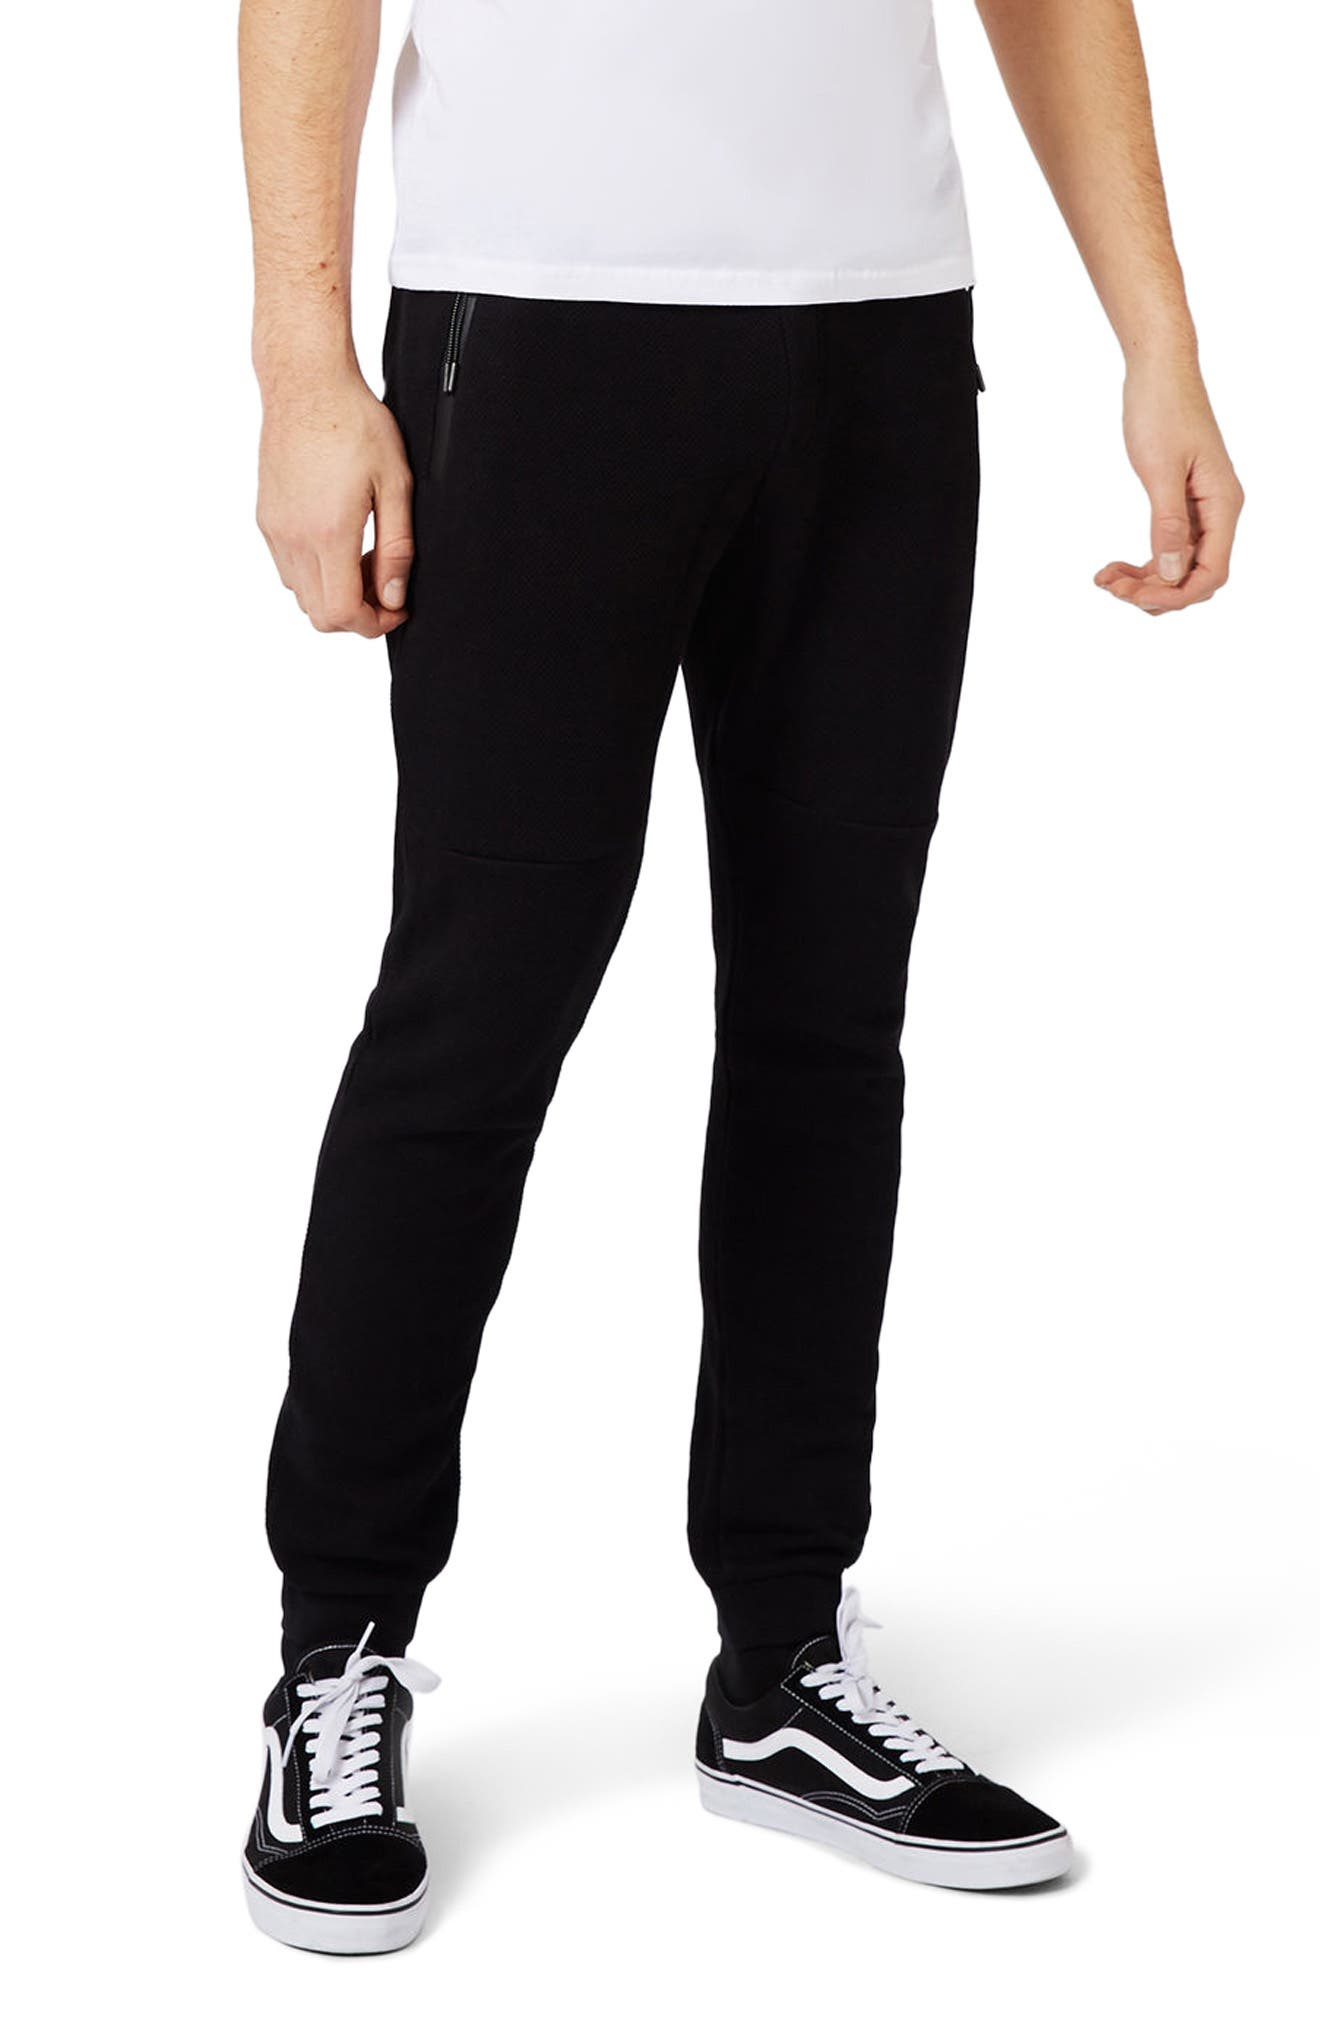 Topman Piqué Knit Jogger Pants